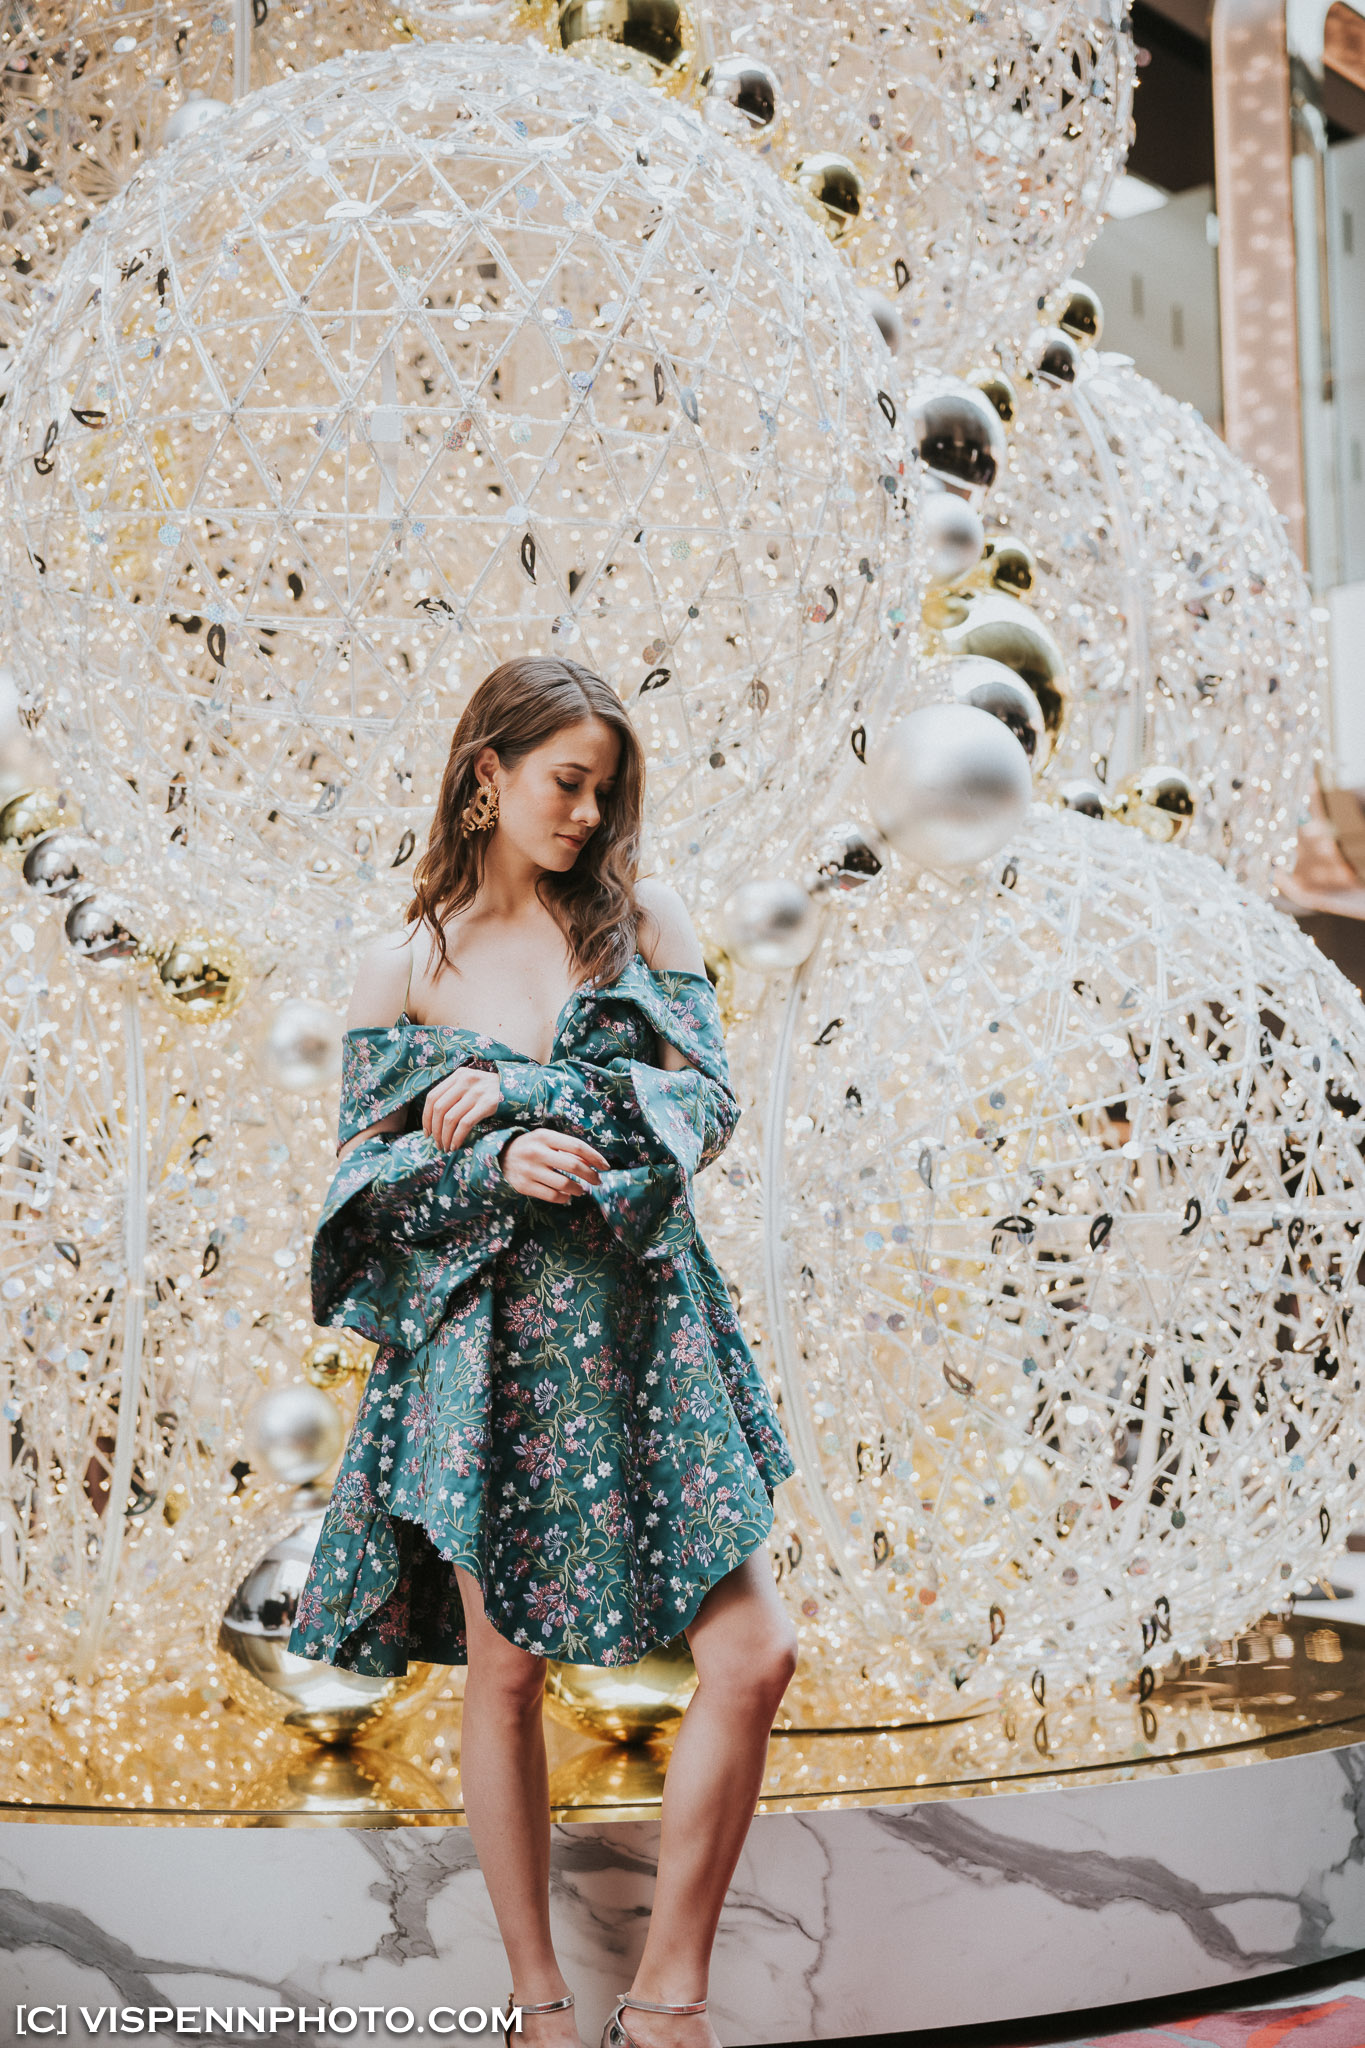 Melbourne Fashion Portrait Commercial Photography VISPENN 墨尔本 服装 商业 人像 摄影 AACTA D3 1282 3P EOSR VISPENN